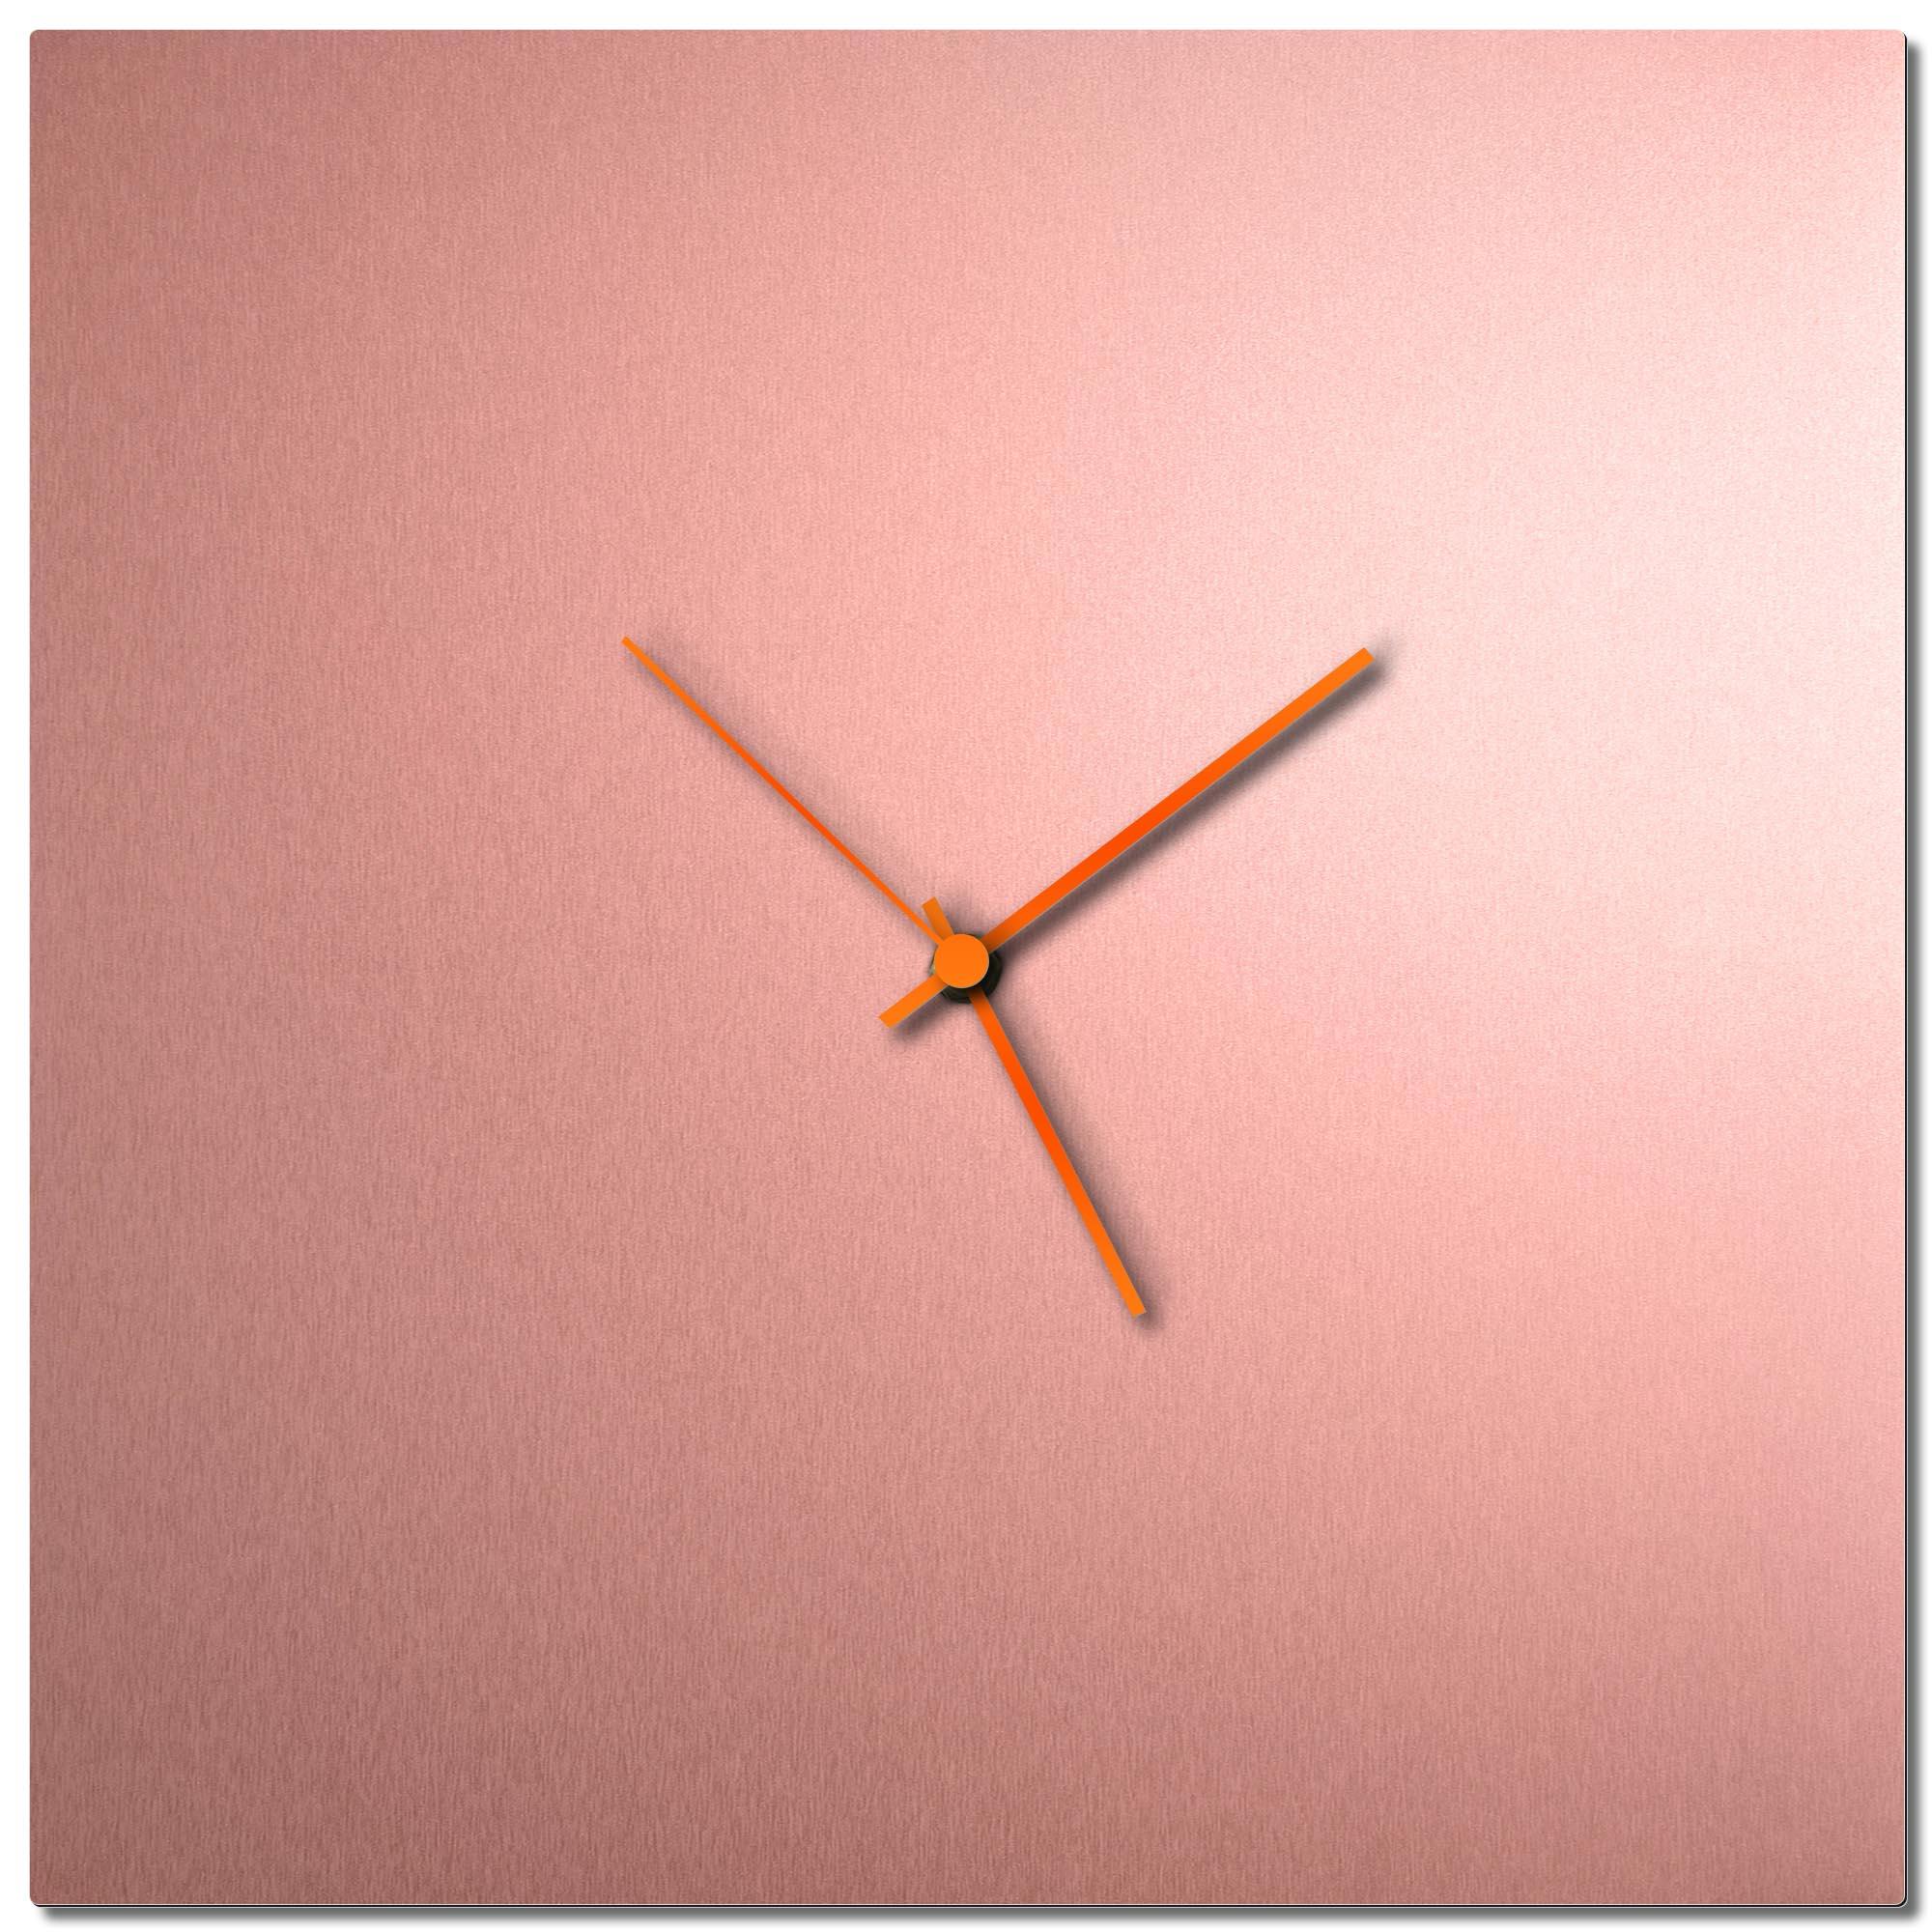 Adam Schwoeppe 'Coppersmith Square Clock Large Orange' Midcentury Modern Style Wall Clock